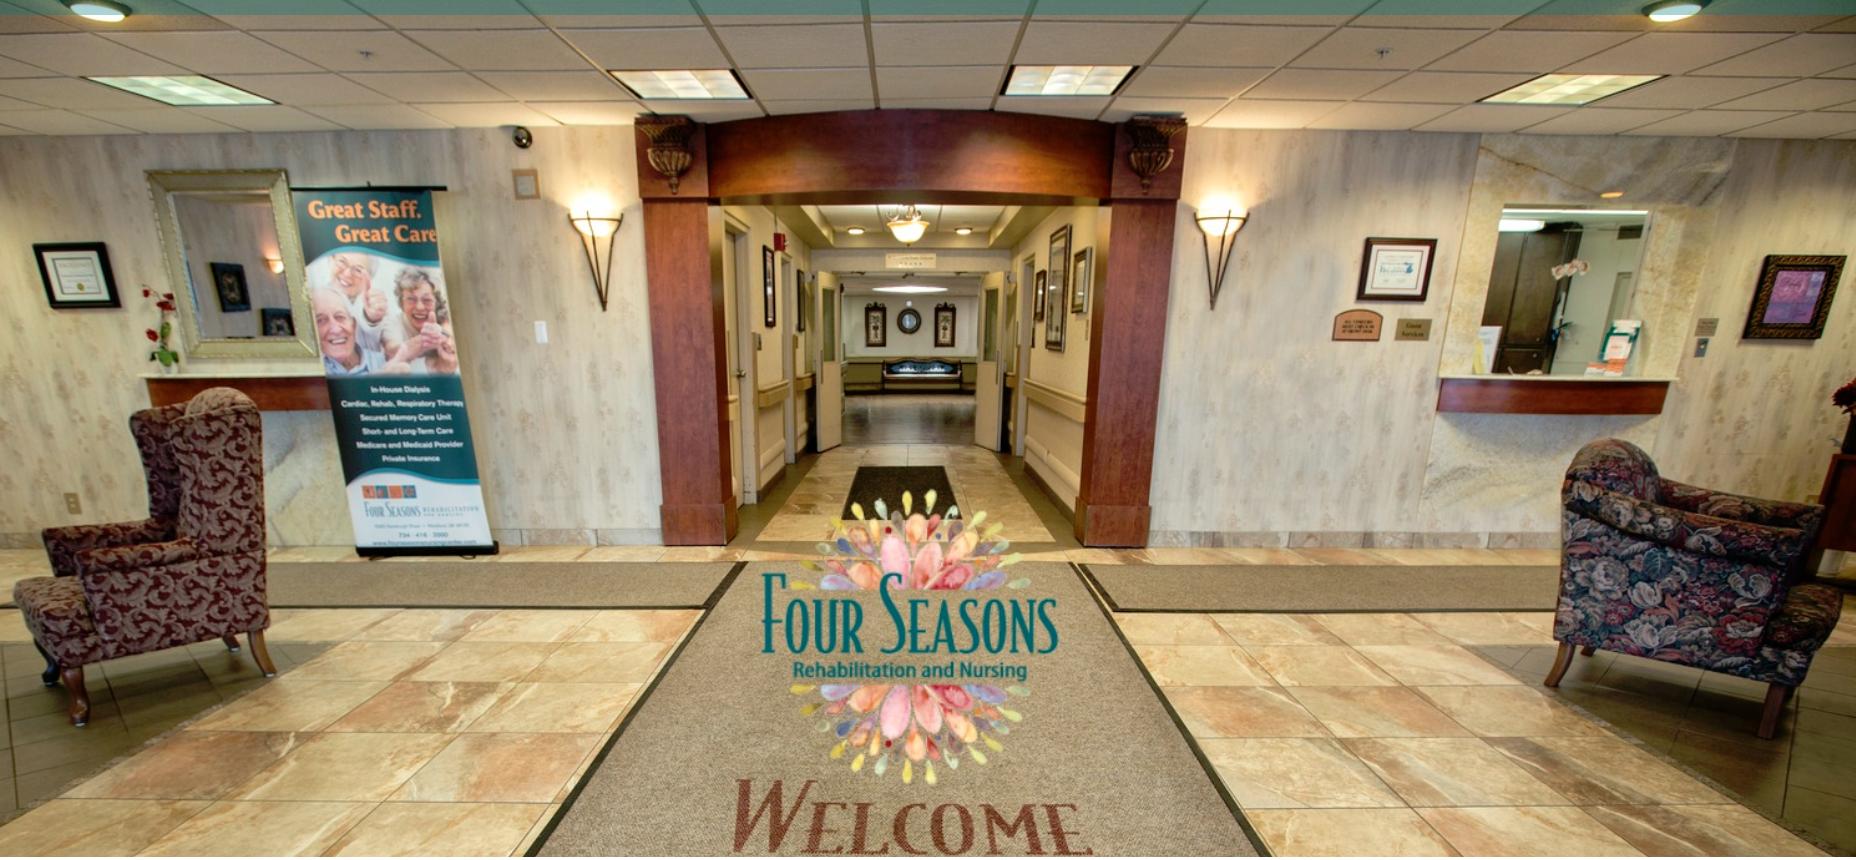 Four Seasons Rehabilitation and Nursing image 0